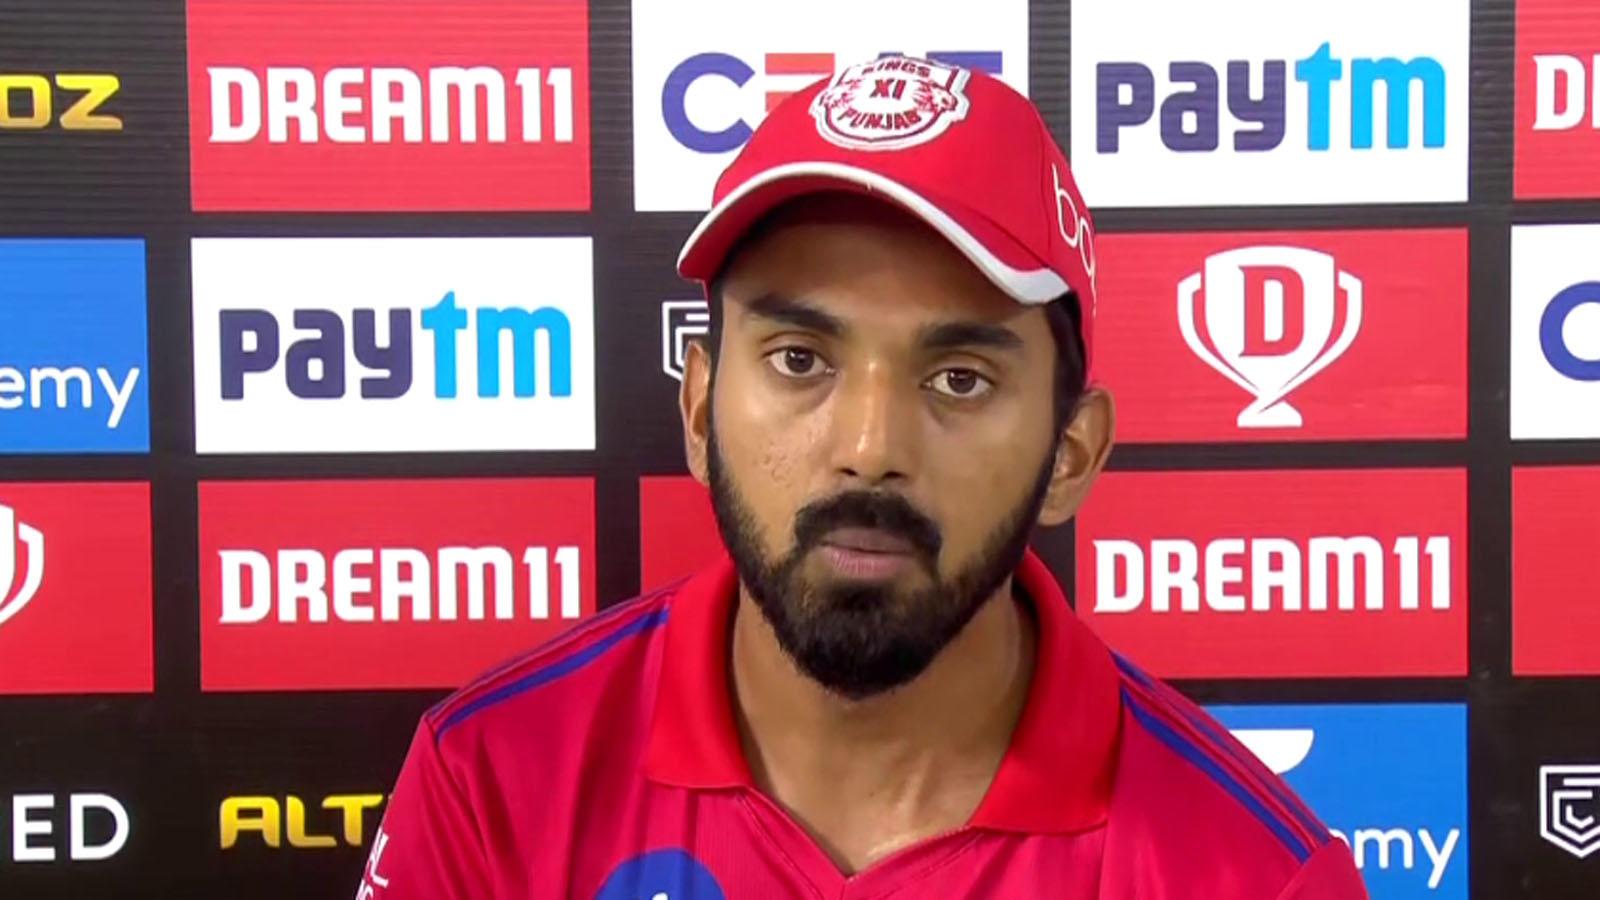 ipl-13-kl-rahul-calls-glenn-maxwell-great-team-man-after-kxip-wins-over-dc